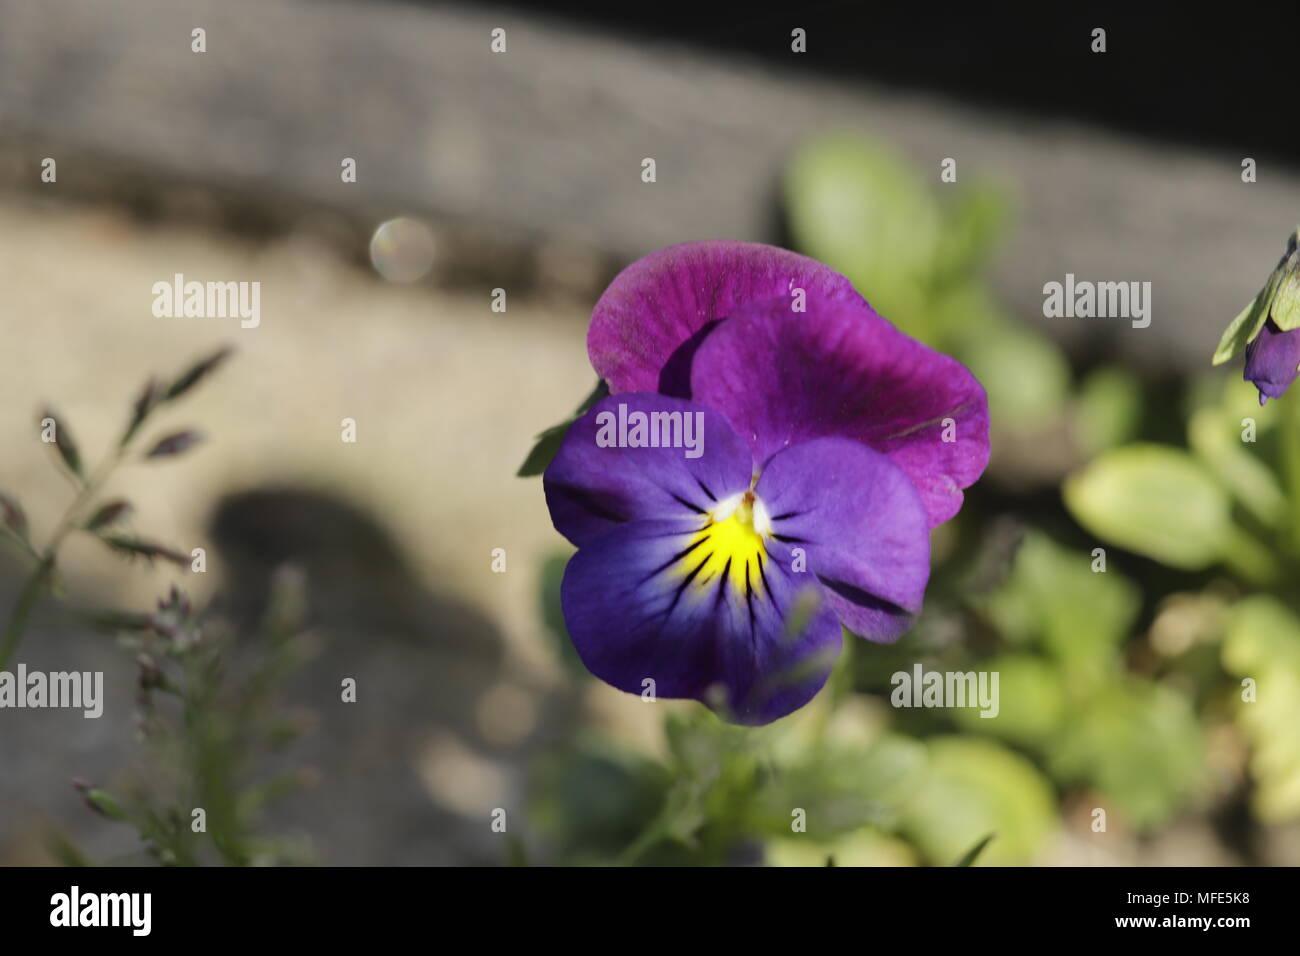 Viola tricolor little violet flowers - Stock Image